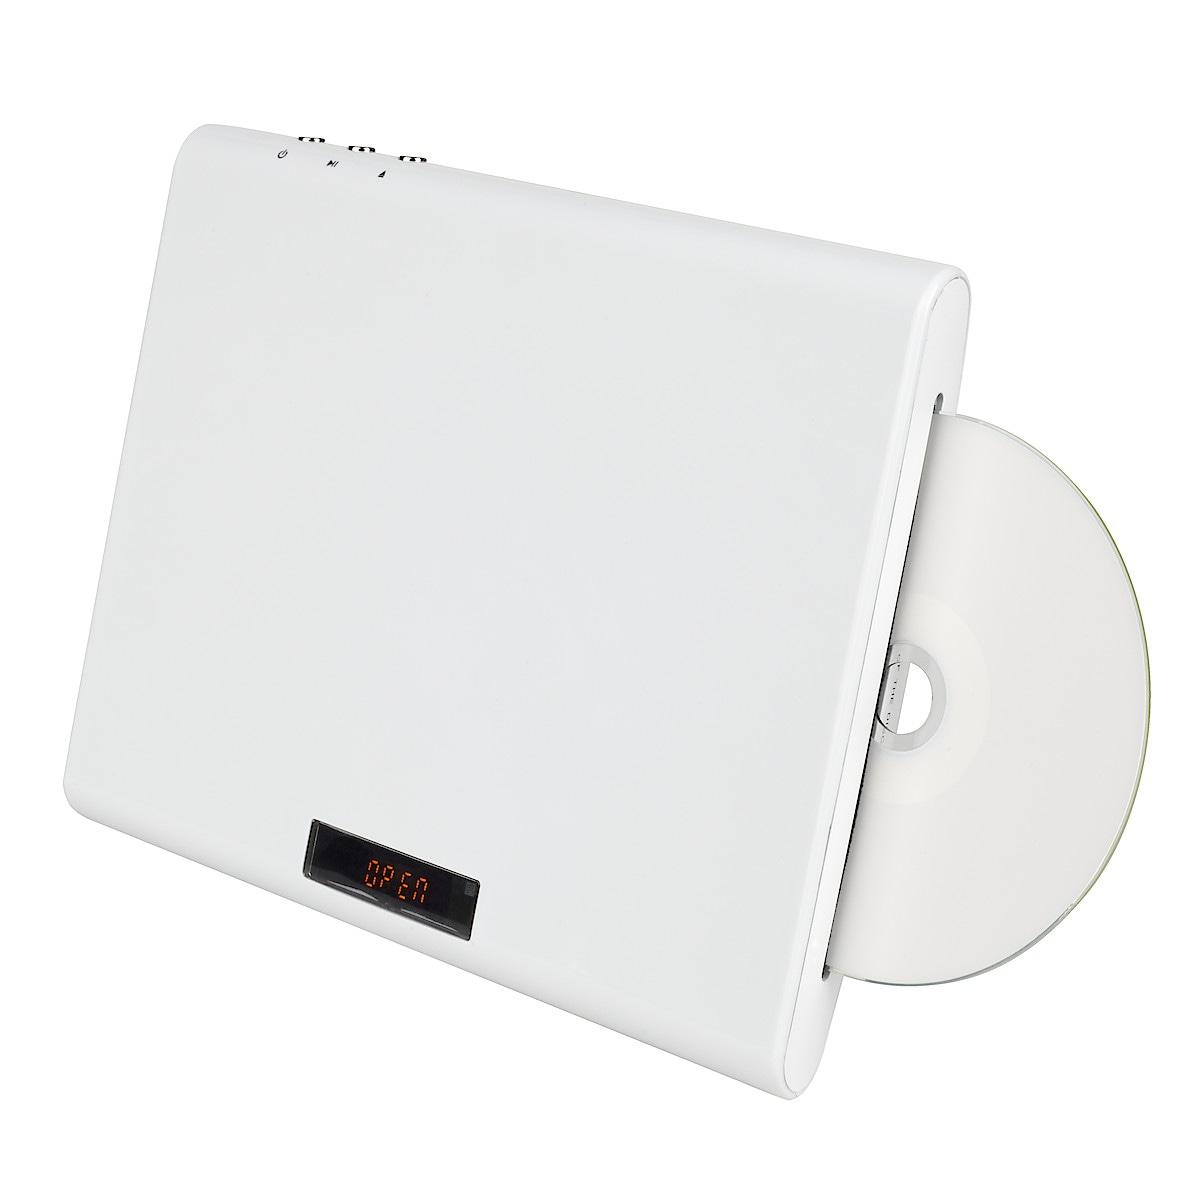 DVD/MPEG4 Player